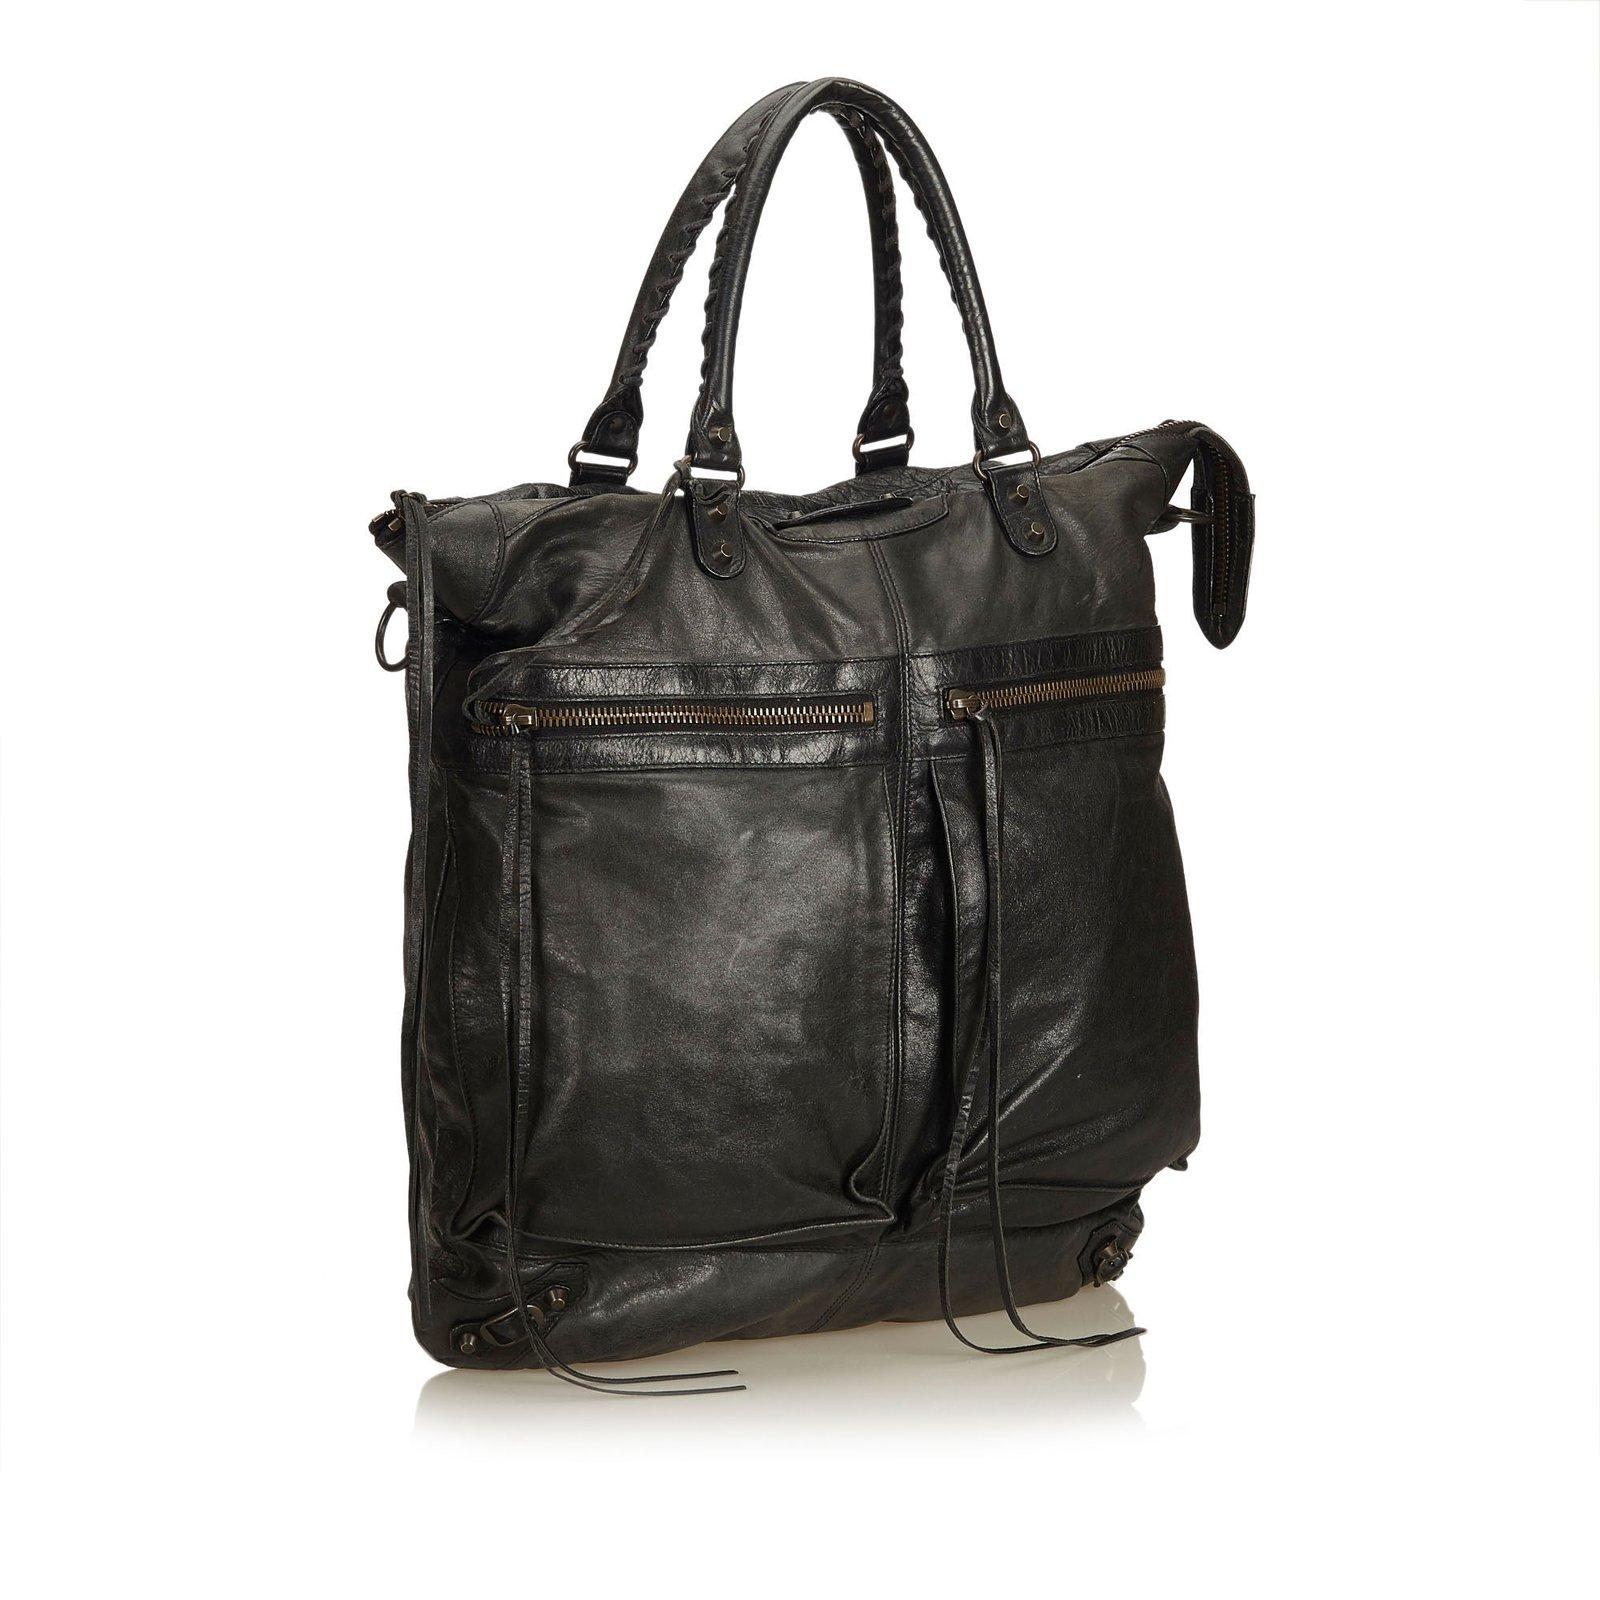 6344694154 Balenciaga Leather Motocross Oversized Square Satchel Handbags  Leather,Other Black ref.90047 - Joli Closet